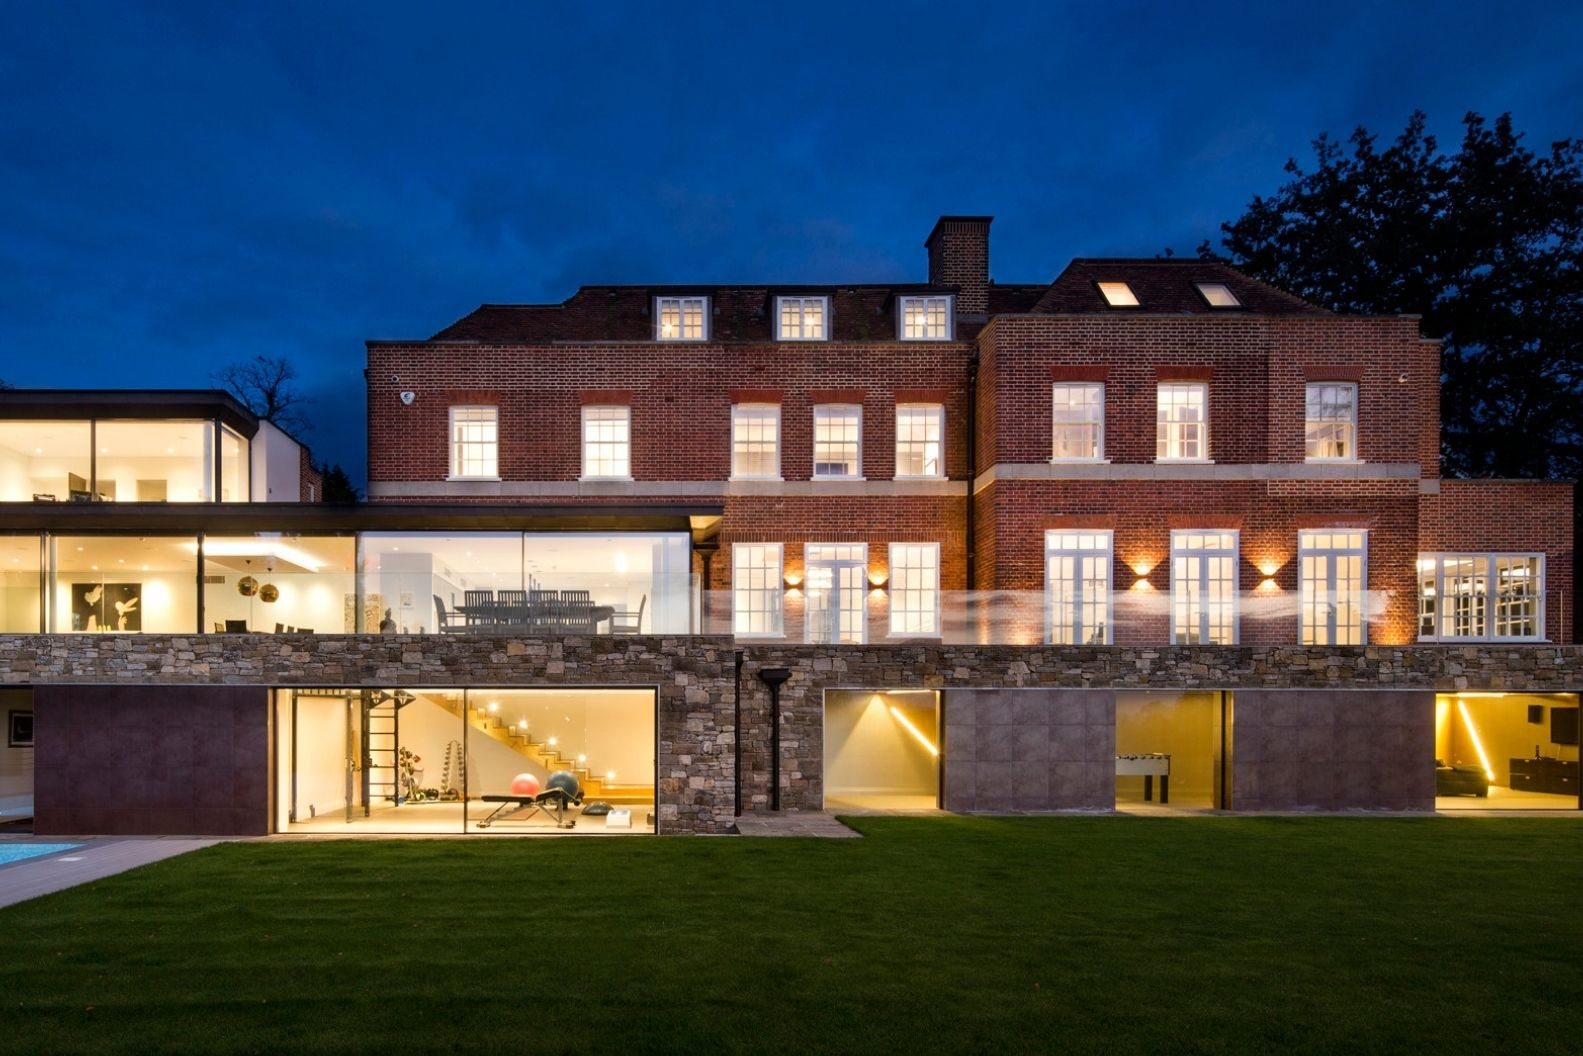 luxury four storey new build home with two pane minimal windows sliding glass doors